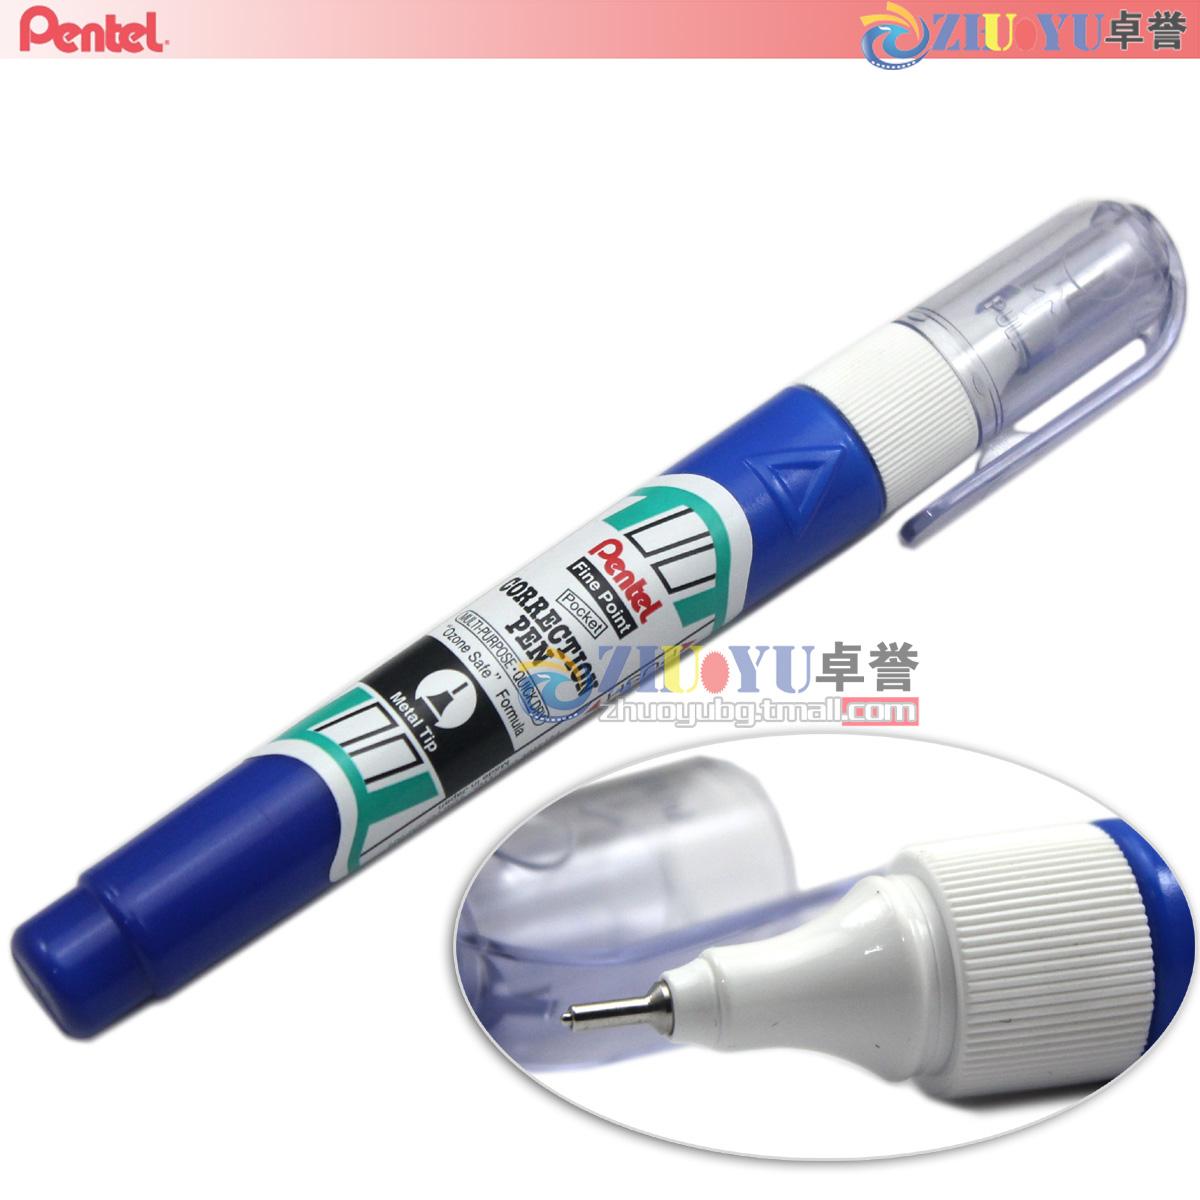 Pentel zl62/w ZL62-W 7ml pentel slicci